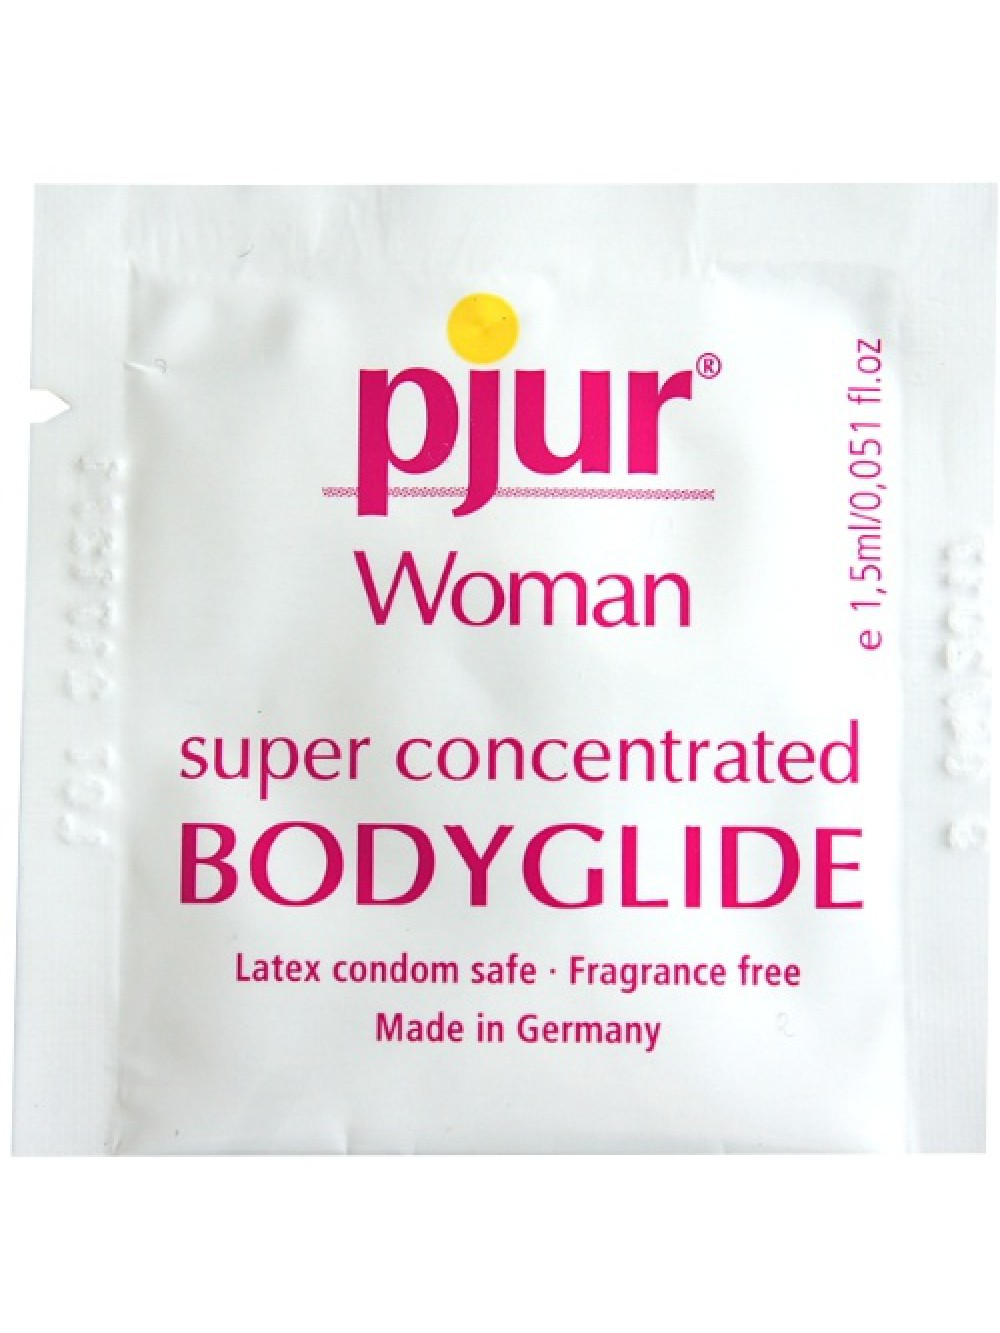 PJUR WOMAN BODY GLIDE SILICONE BASED LUBRICANT 1,5 ML